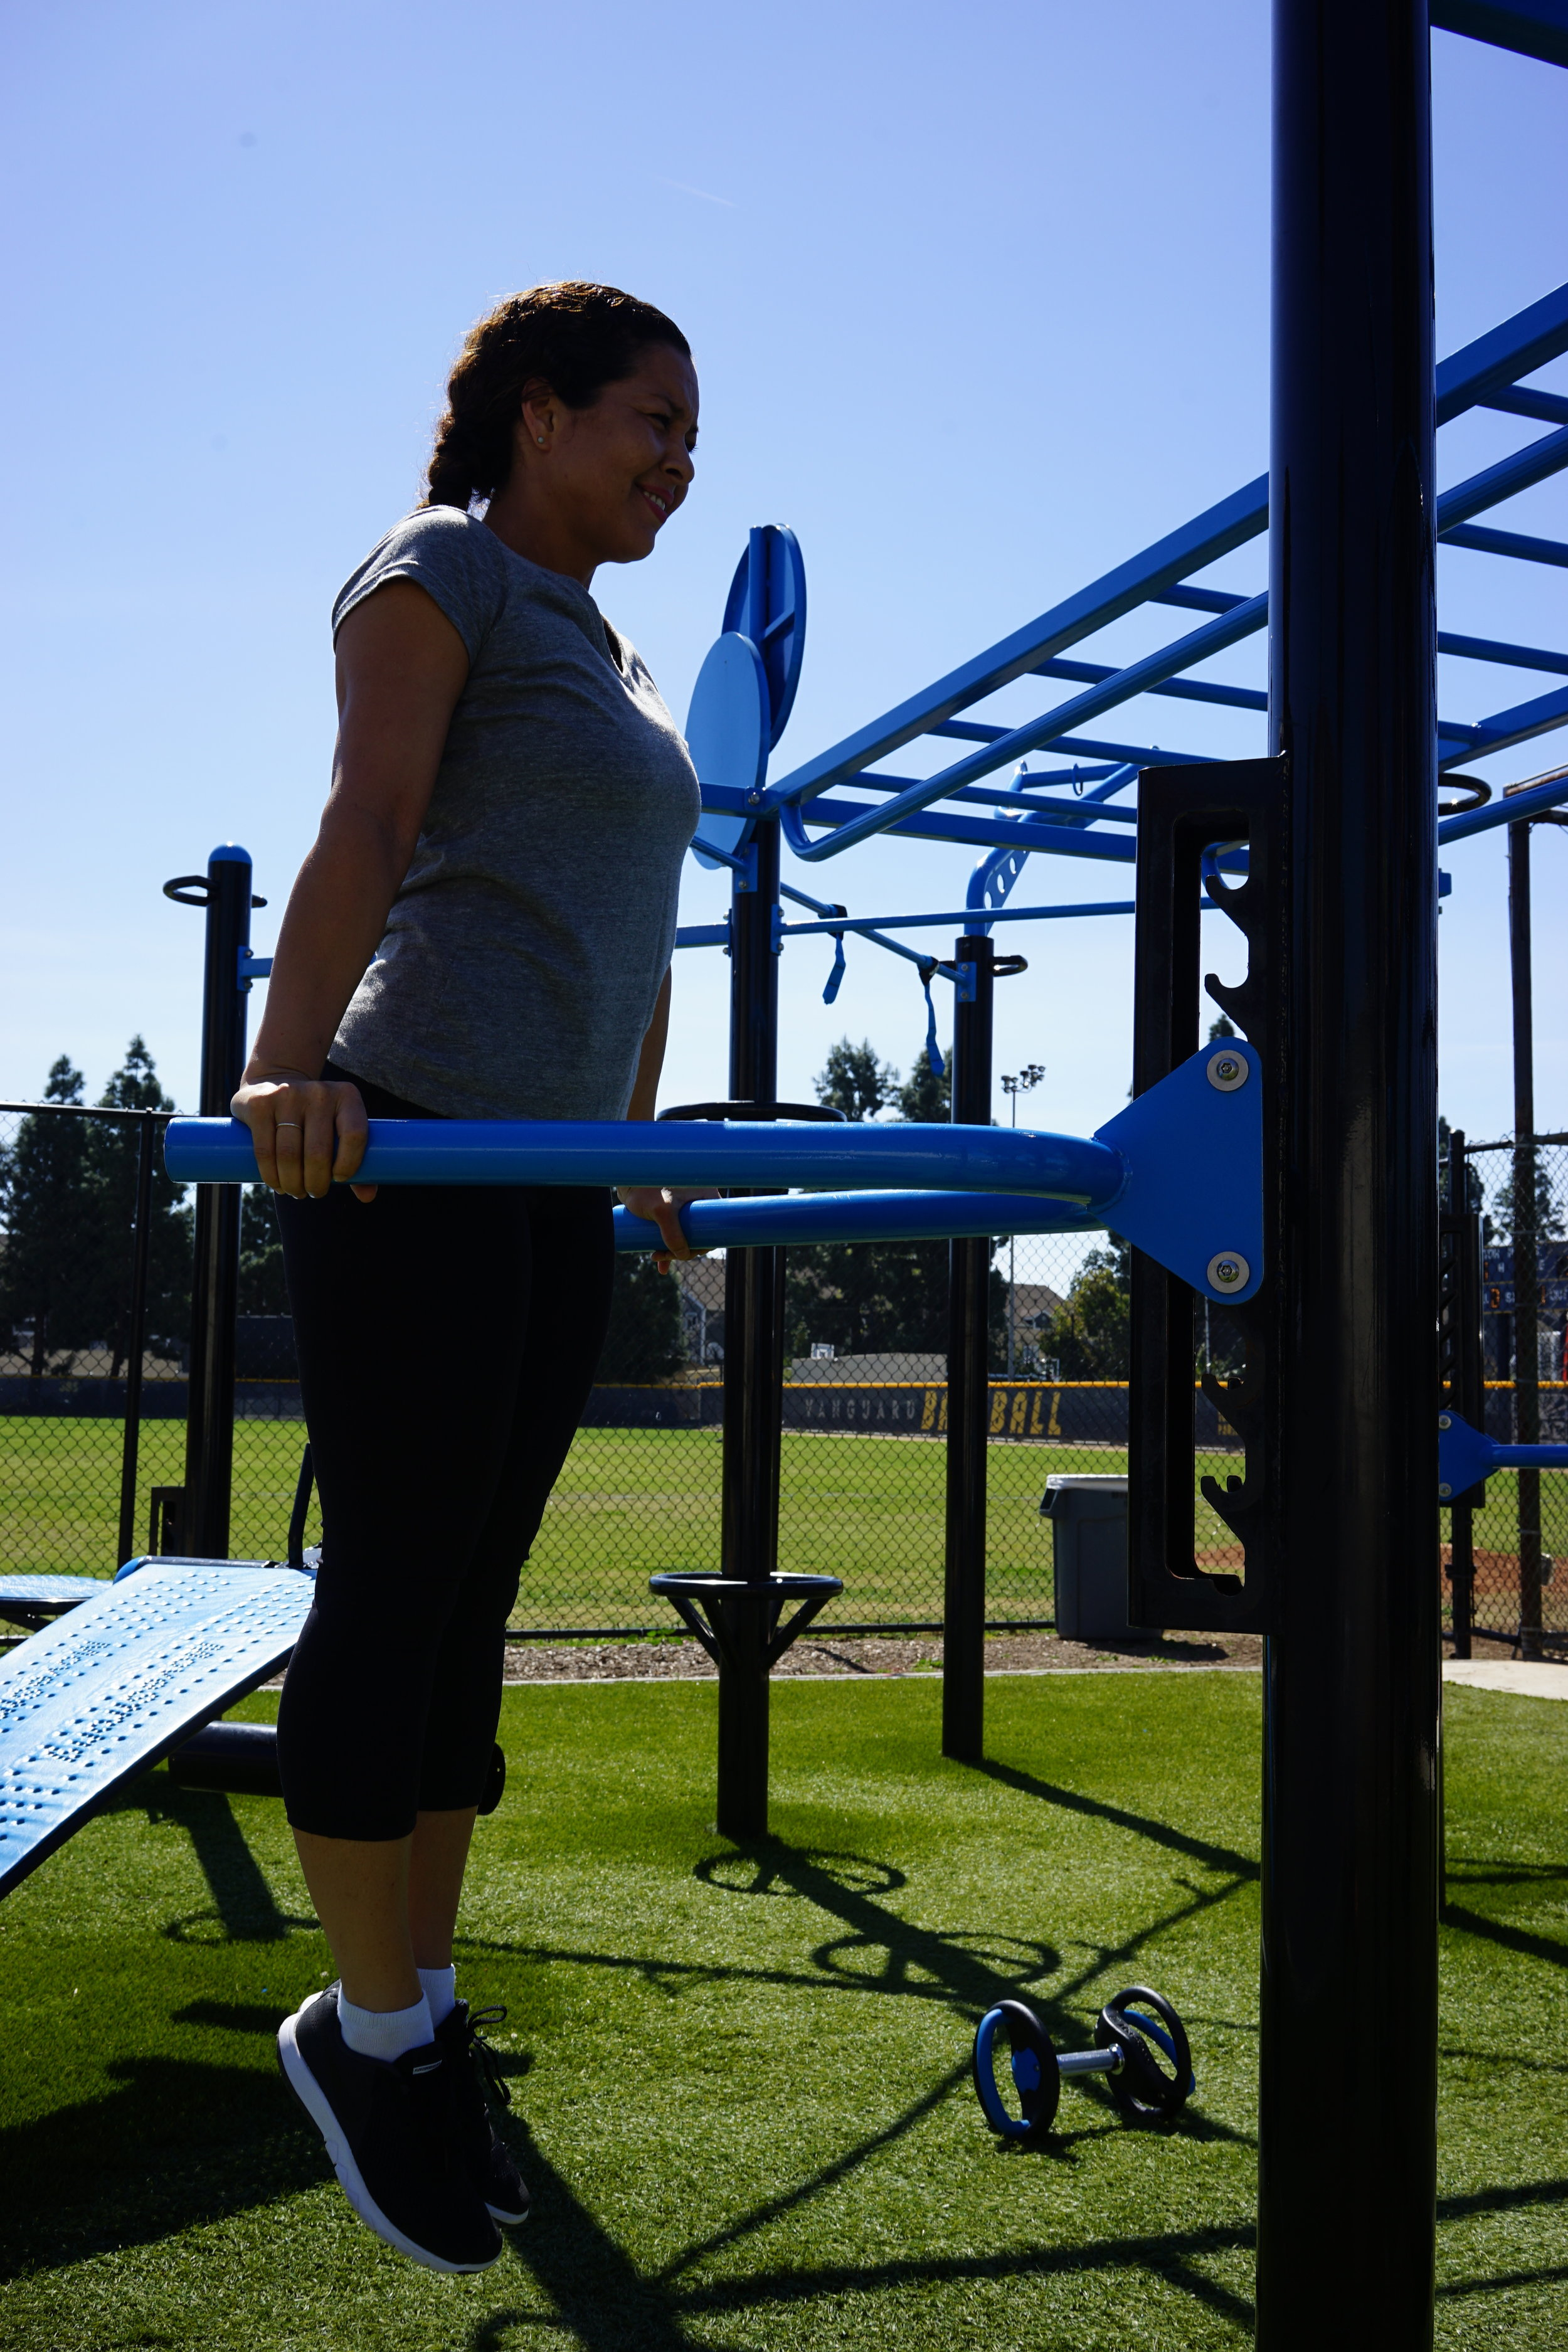 Adjustable dip bar outdoor fitness